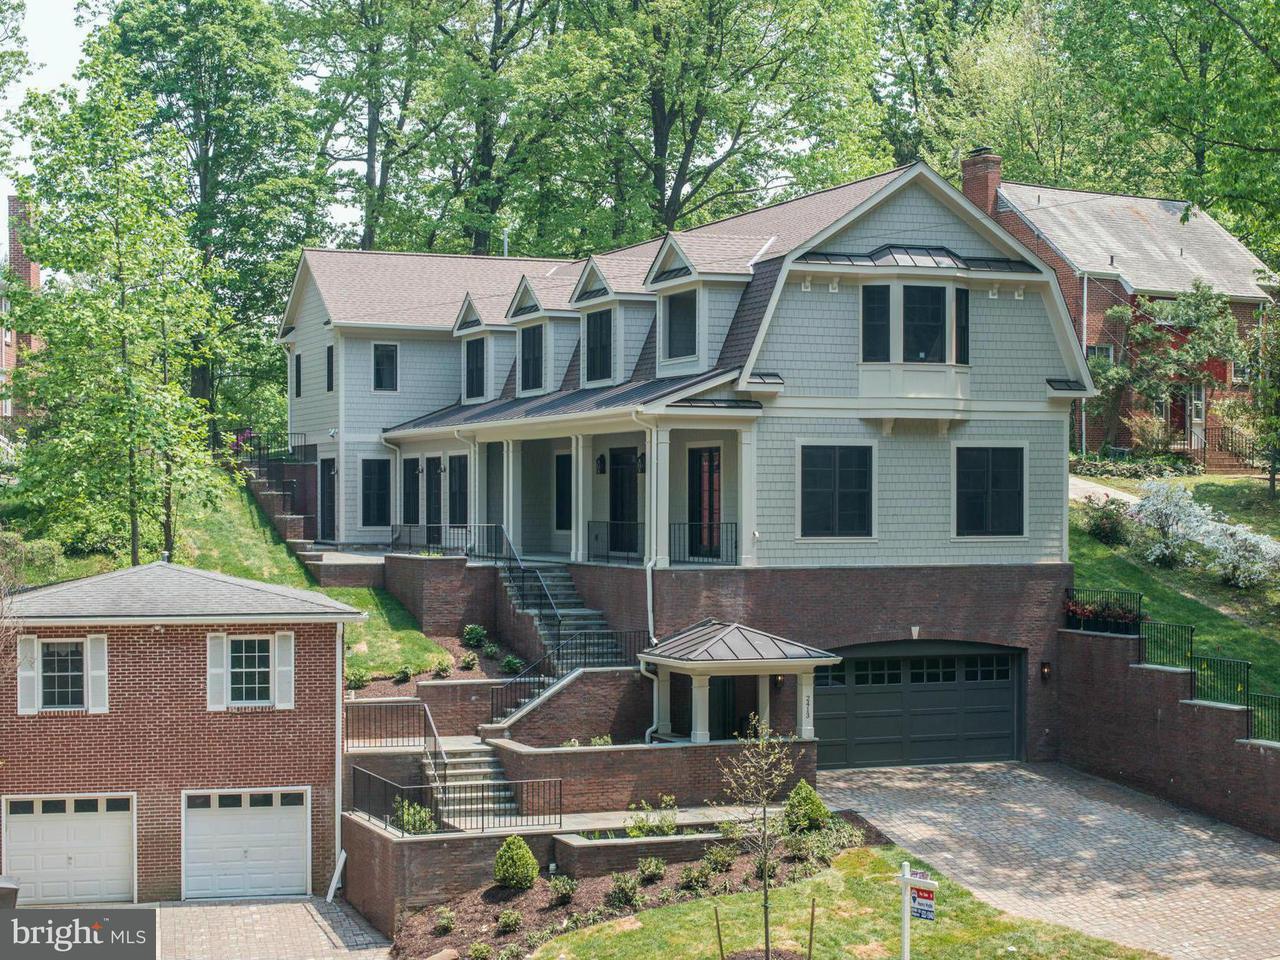 Single Family Home for Sale at 2413 VERNON ST N 2413 VERNON ST N Arlington, Virginia 22207 United States